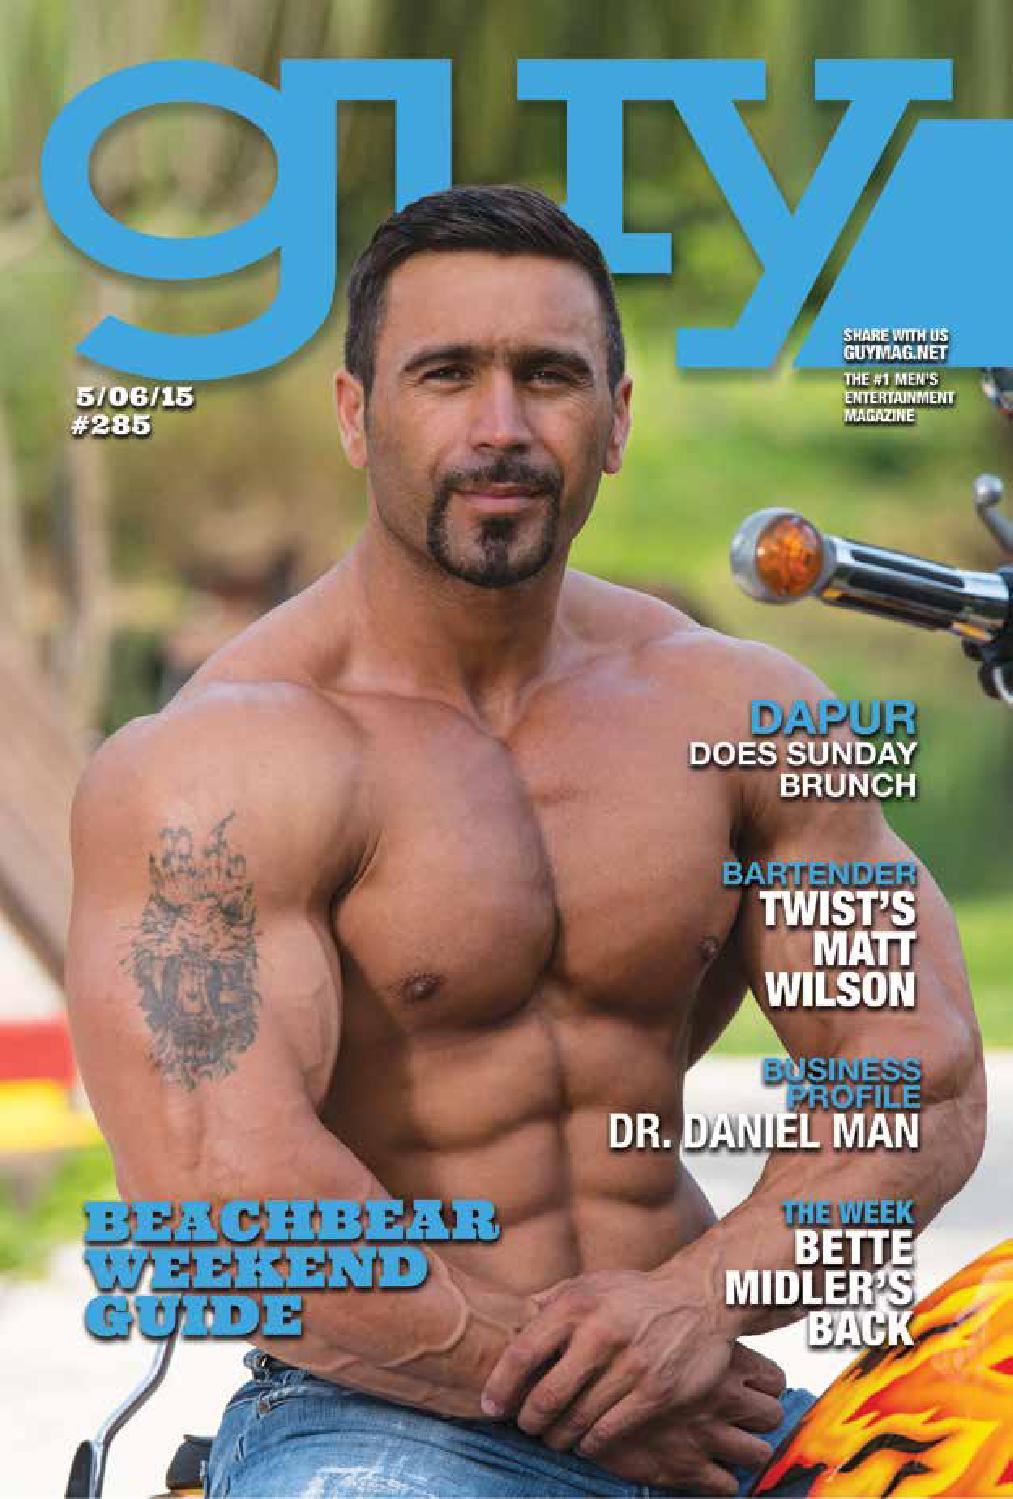 Actor Porno Milan Gamiani guy 050615 issue 285multi-media platforms - issuu